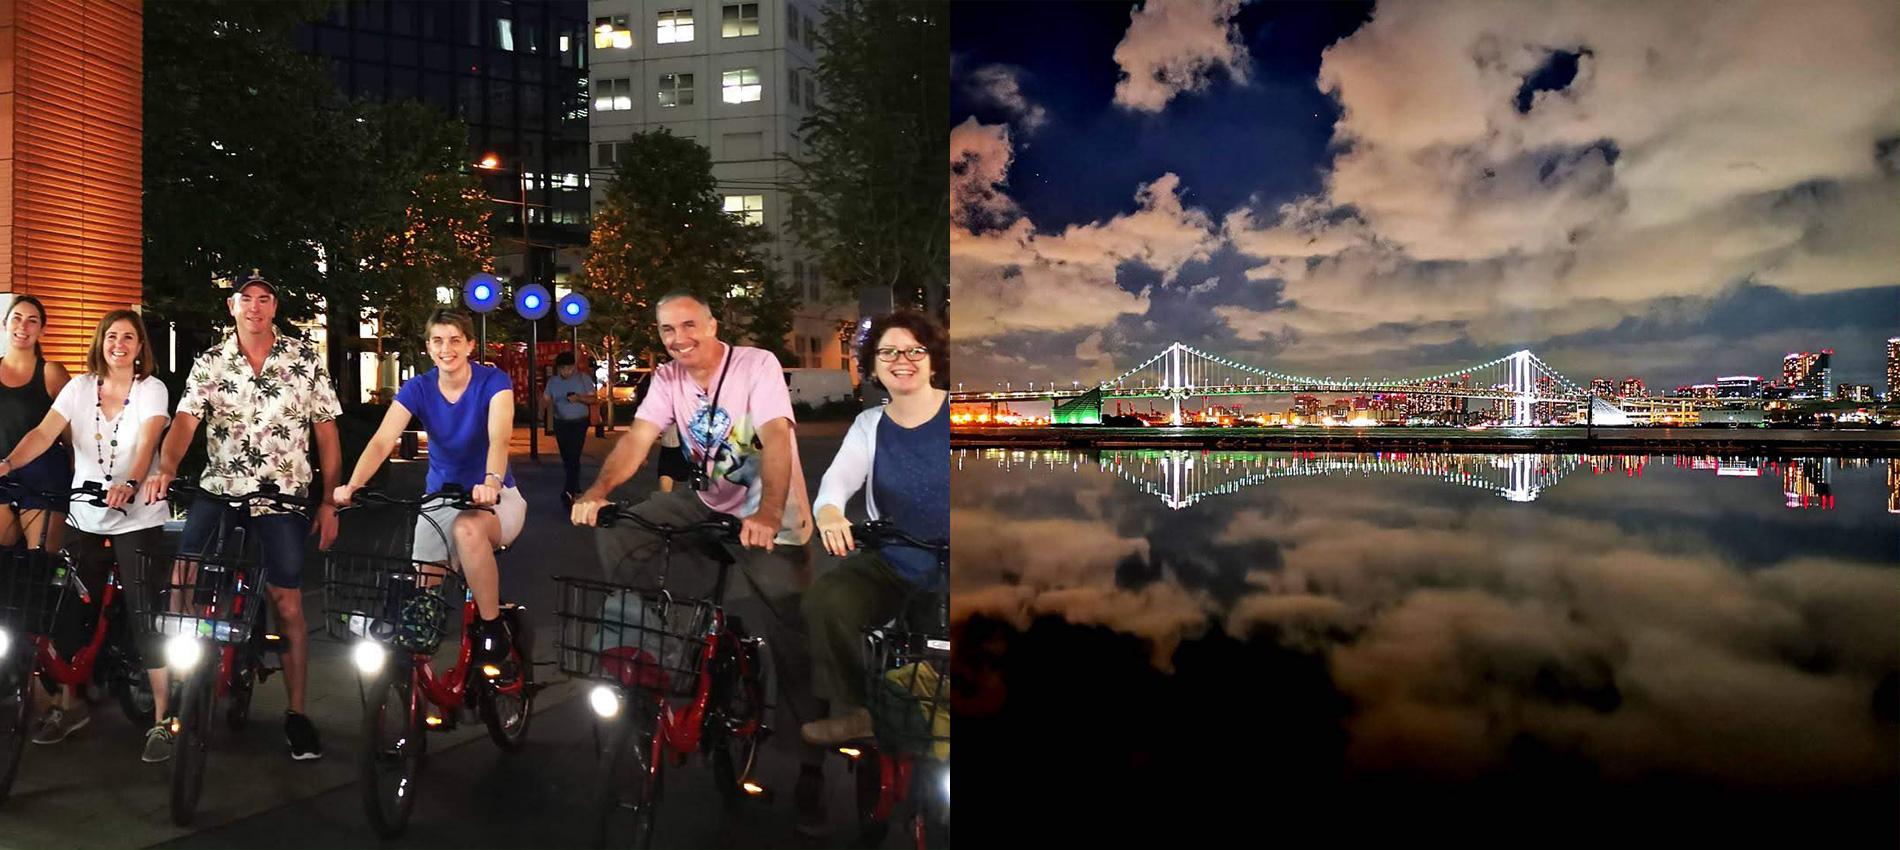 Tokyo at Night with E-Bike to Harumi Wharf